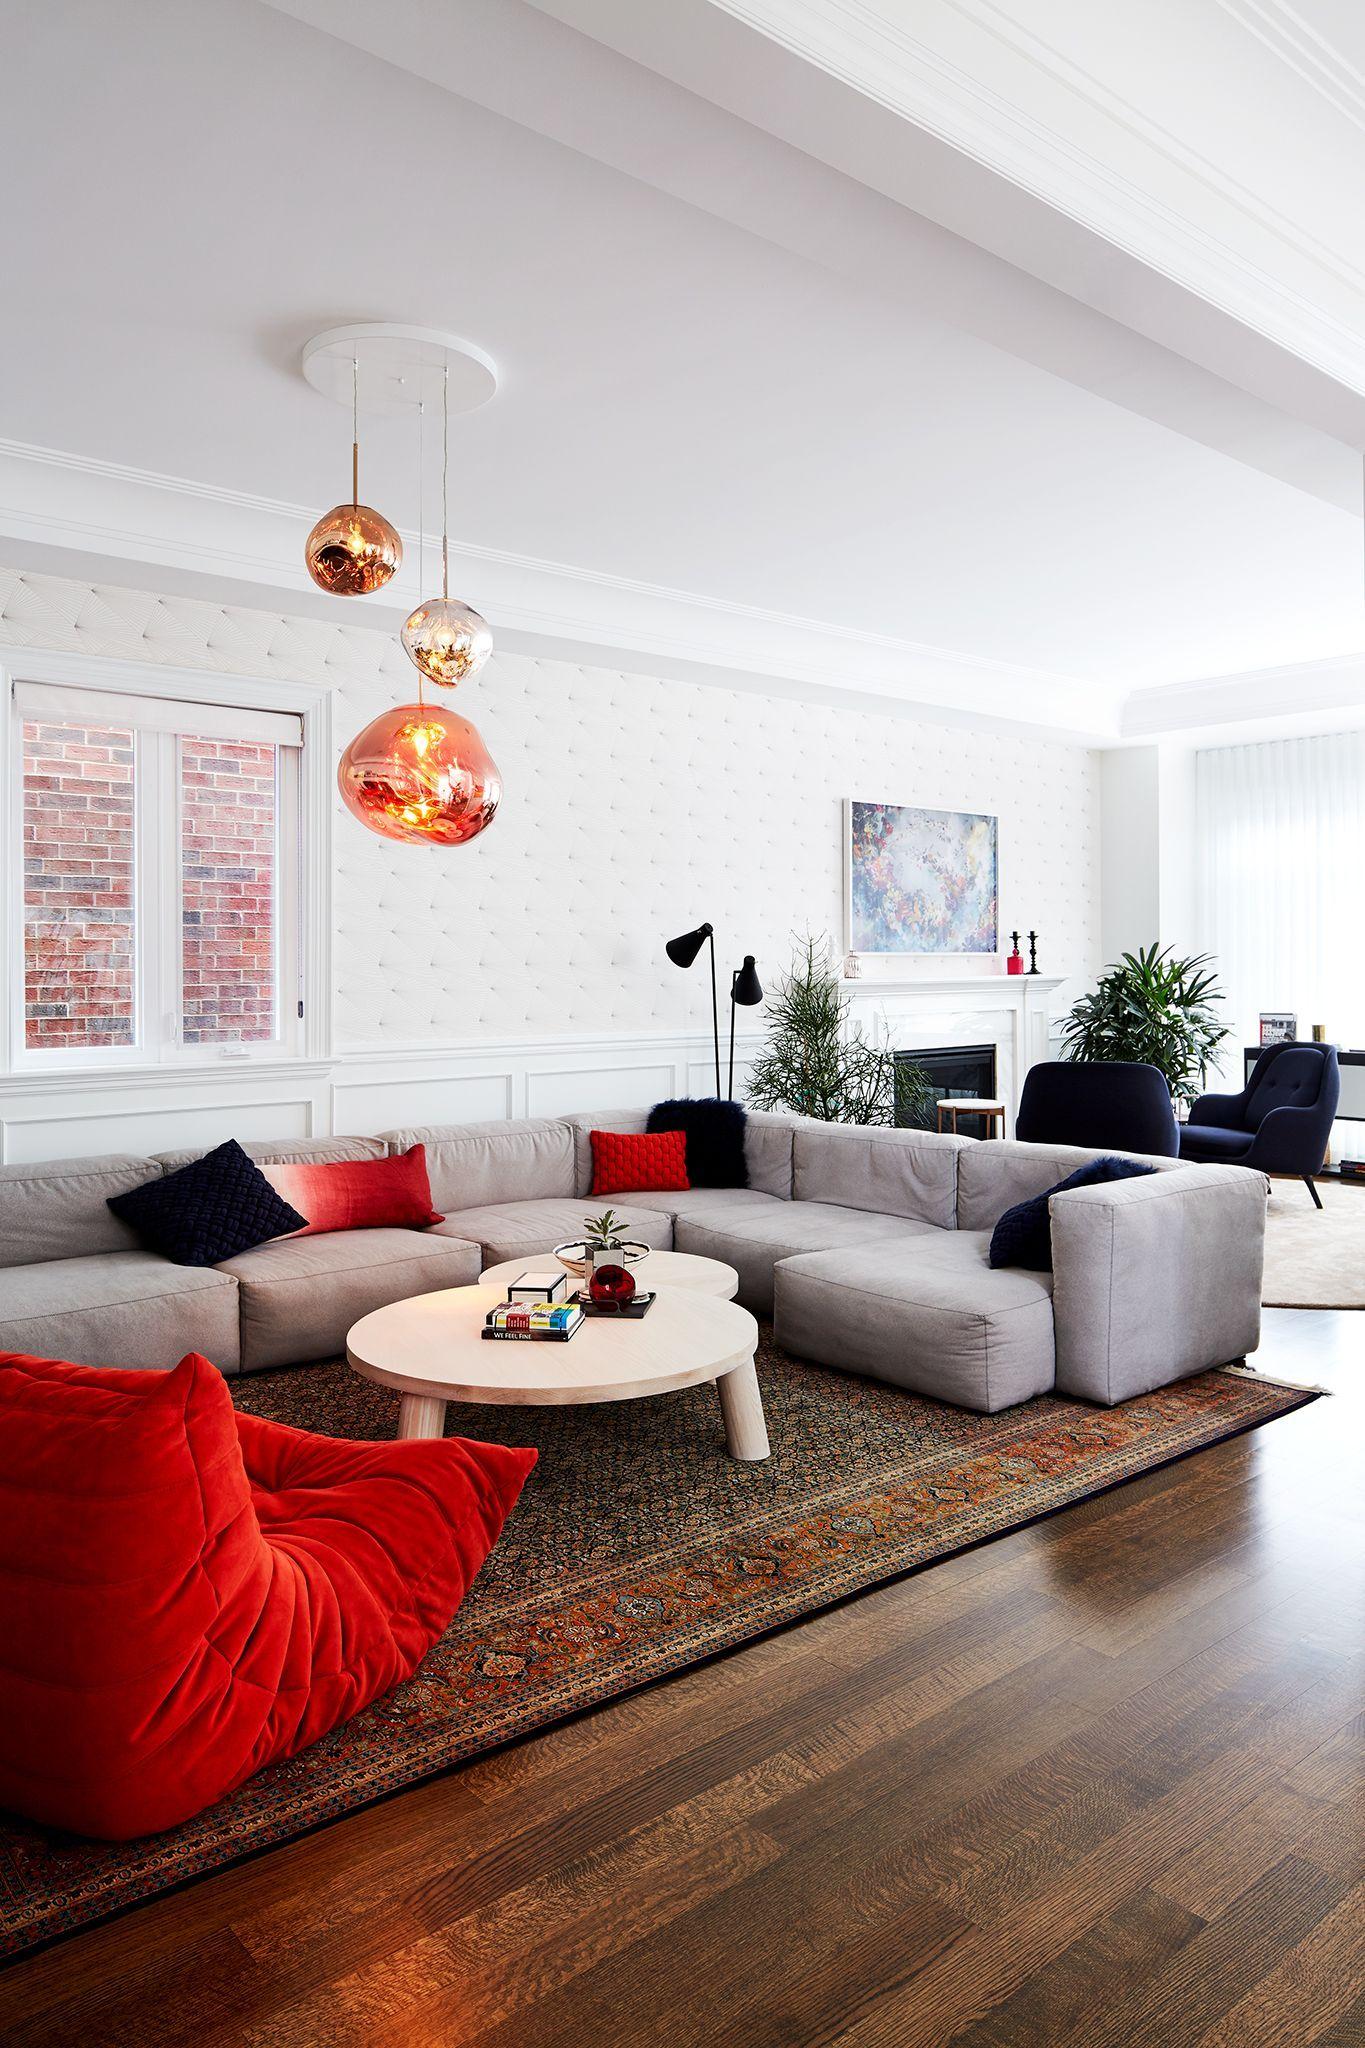 Pin By Xtra Designs On Tom Dixon Tom Dixon Melt Interior Design Living Room Interior Deco